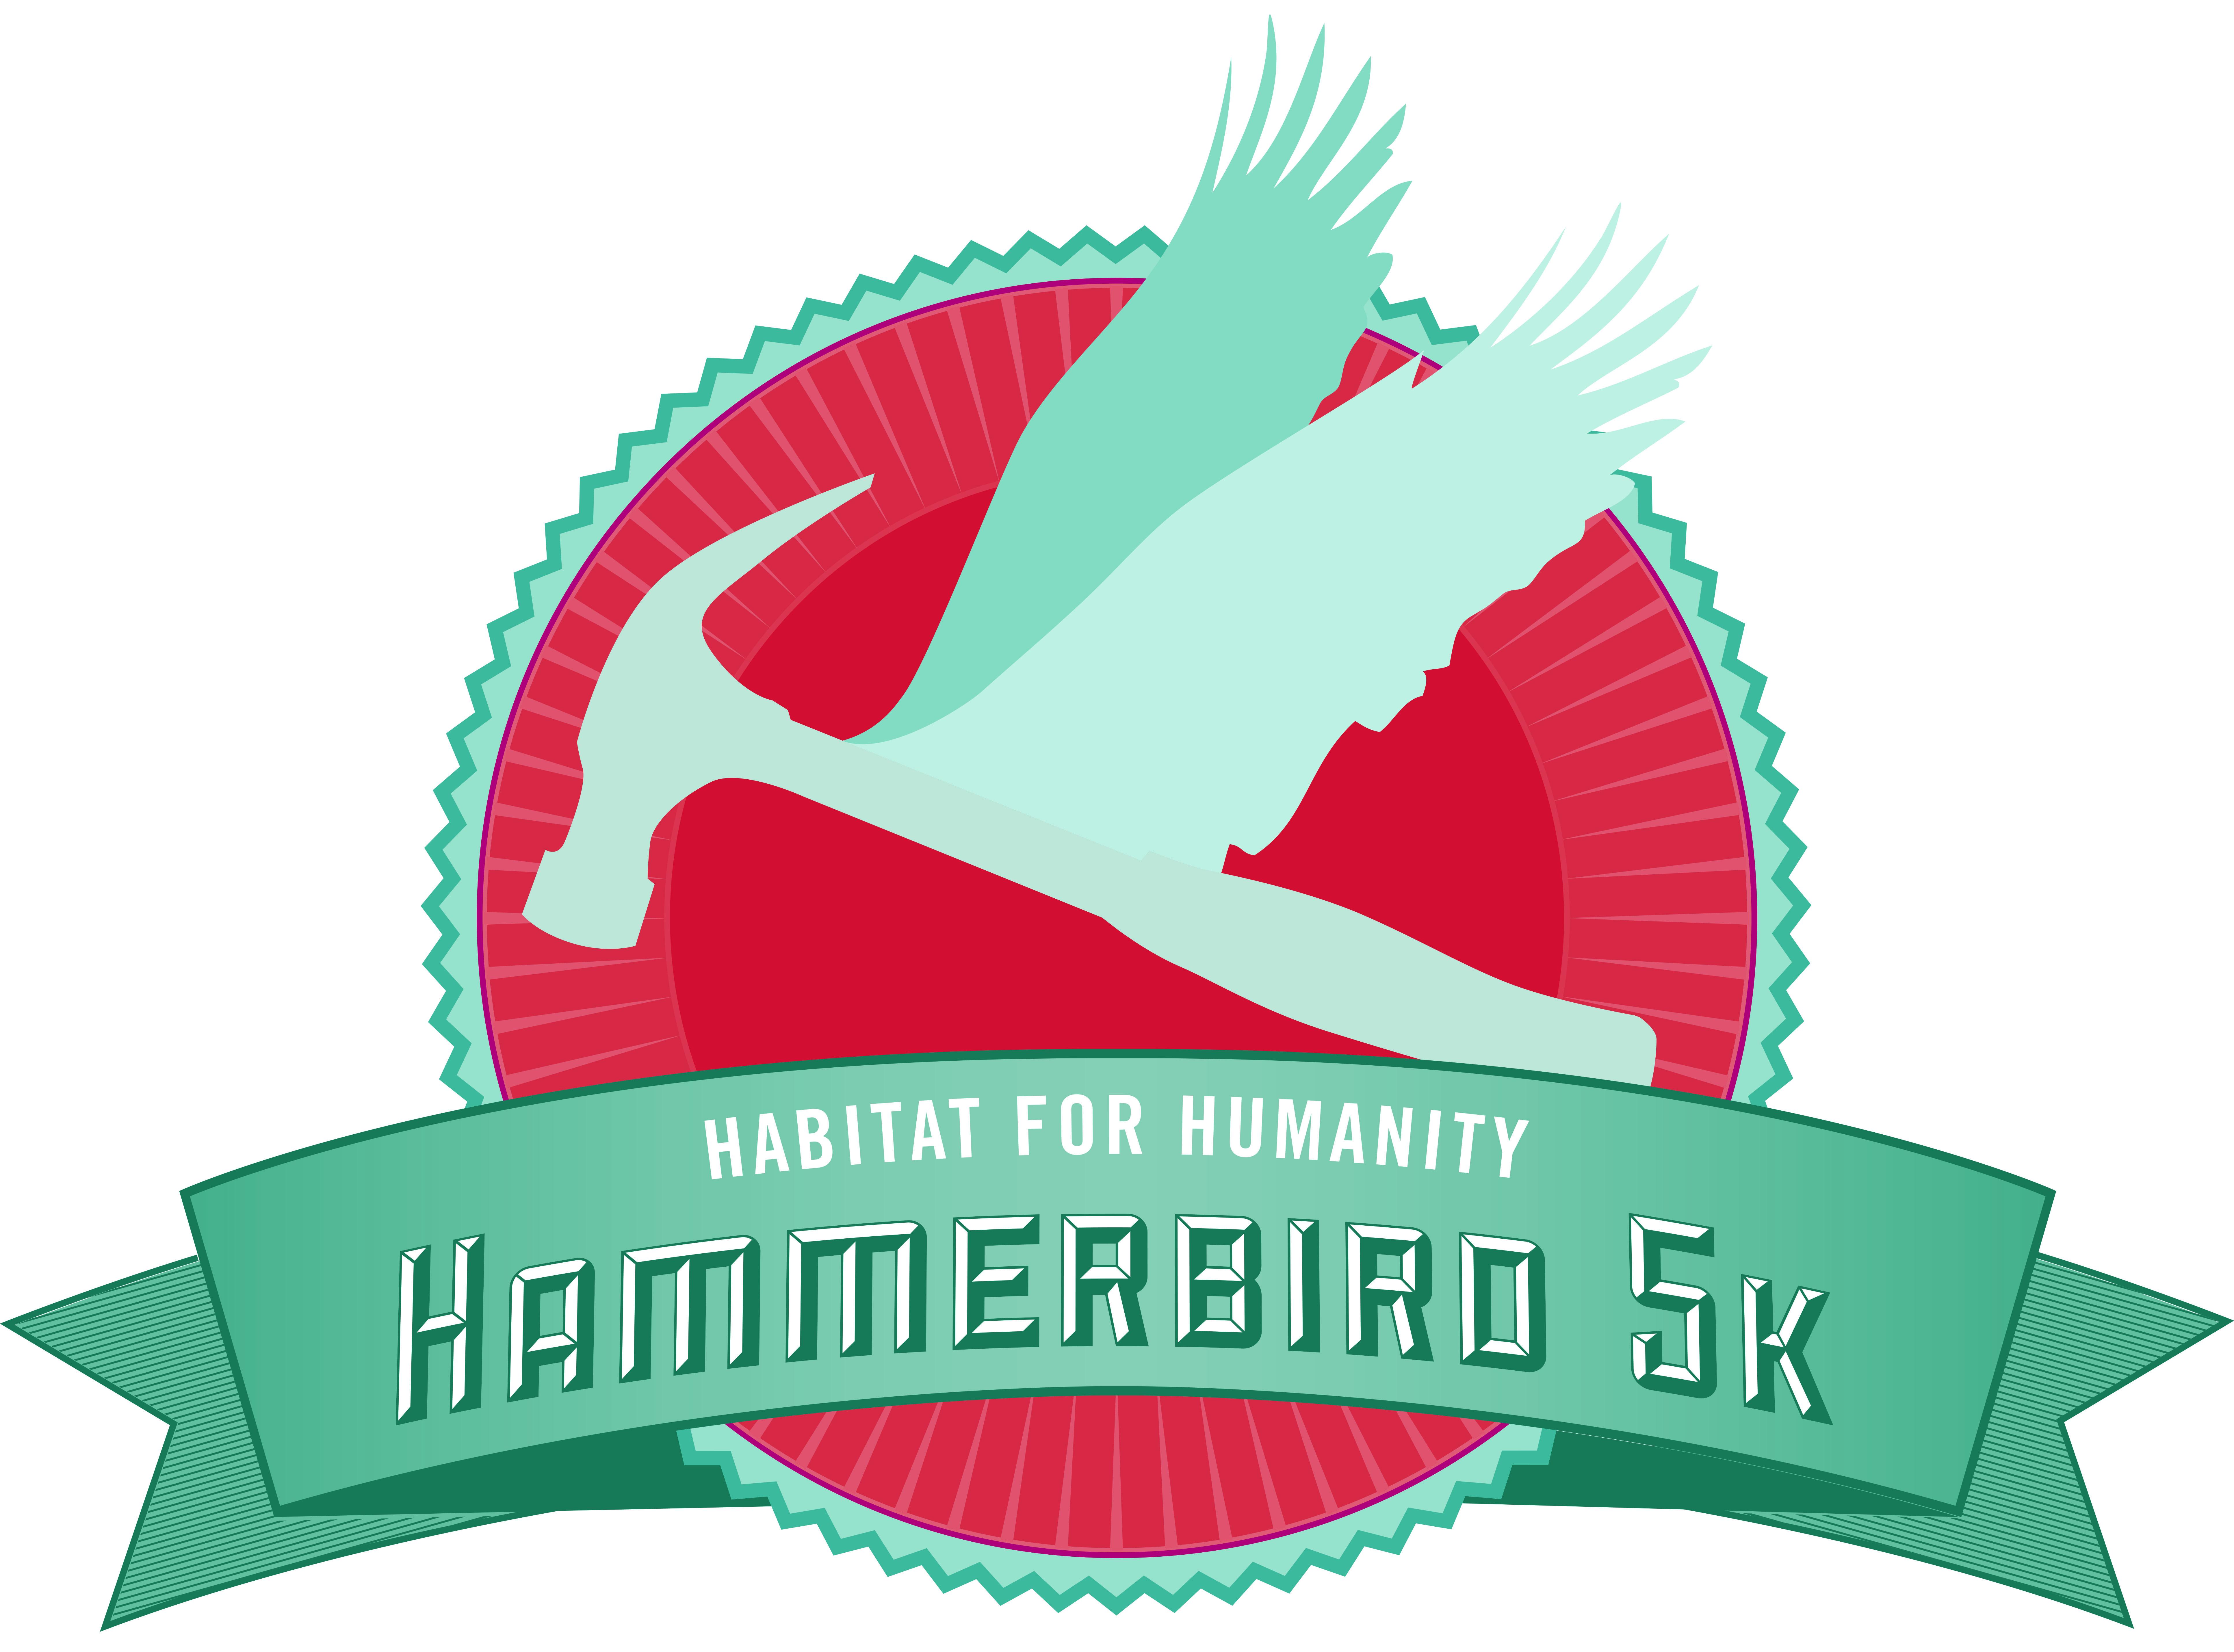 The Habitat Hammerbird 5K and 1 Mile Run/Walk